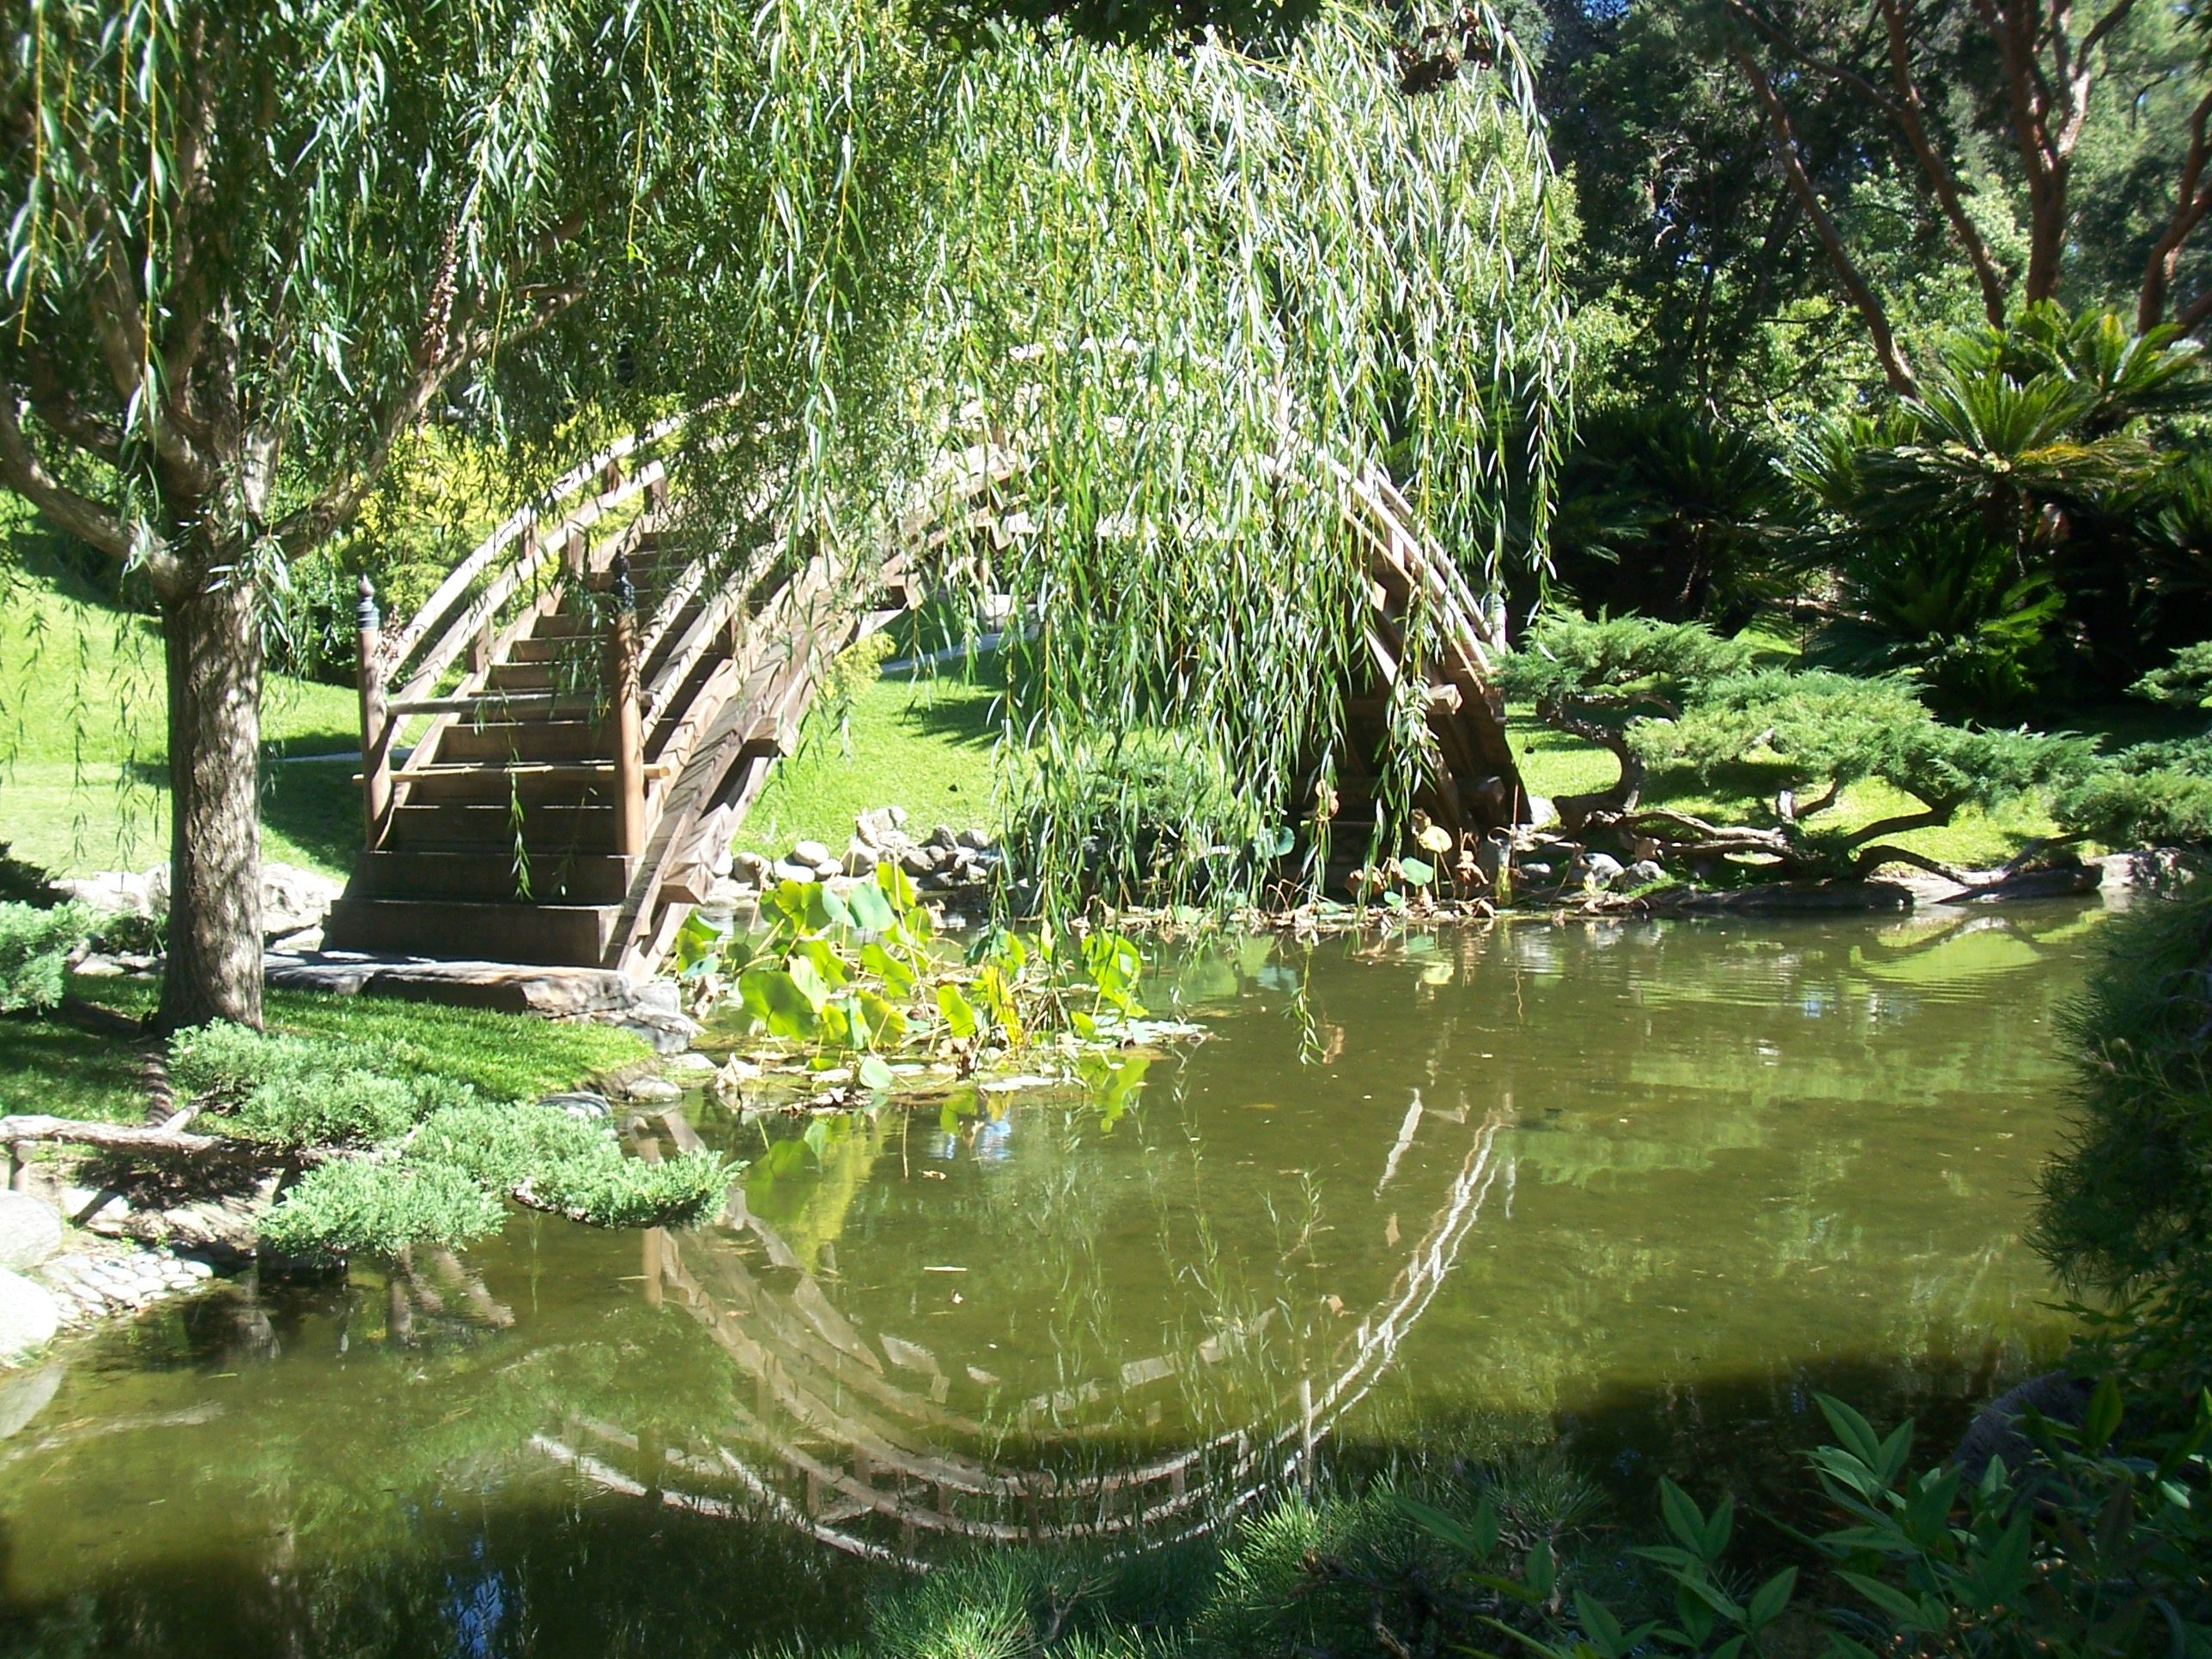 Japanese Garden At The Huntington Library Pasadena California The Huntington Library Pinterest